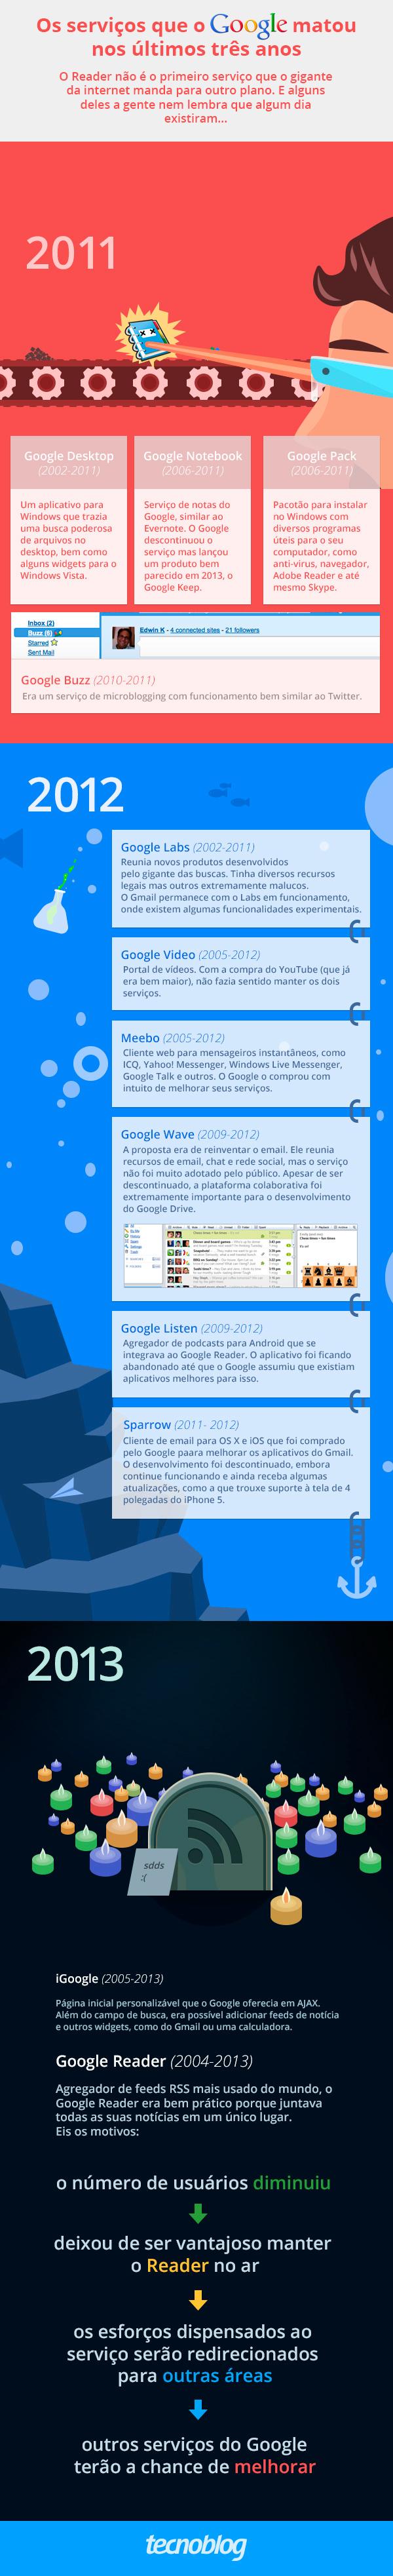 google-infografico-servicos-mortos